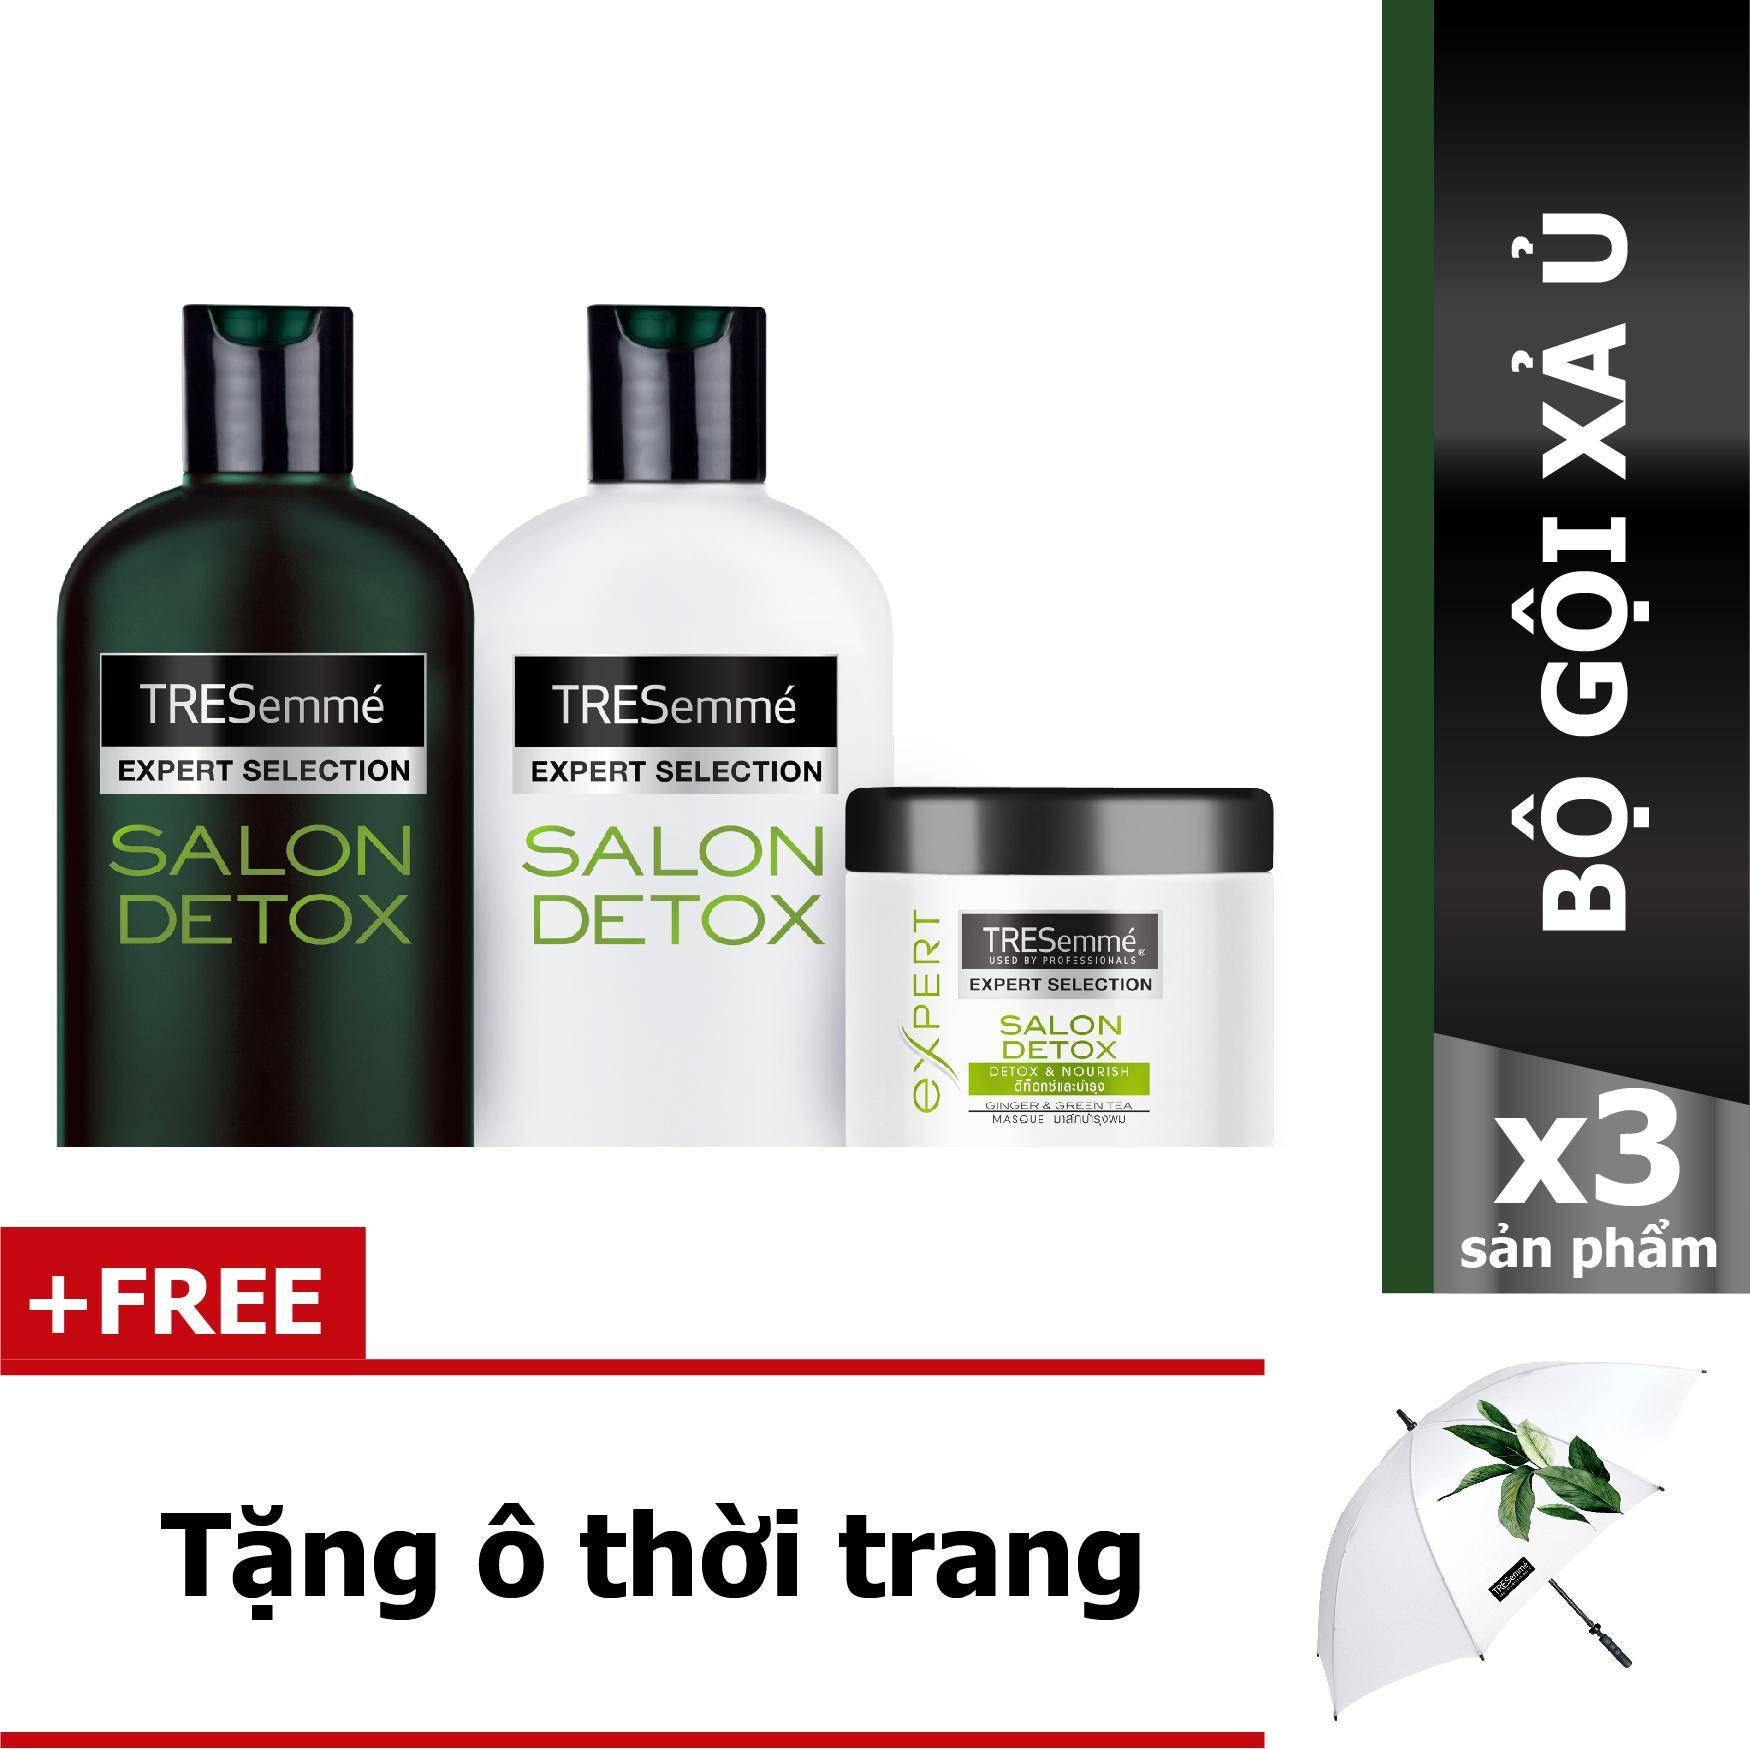 Combo Tresemme Salon Detox bao gồm: Dầu gội 340g + dầu xả 340g + Kem Ủ 180ml + Tặng 01 dù Detox